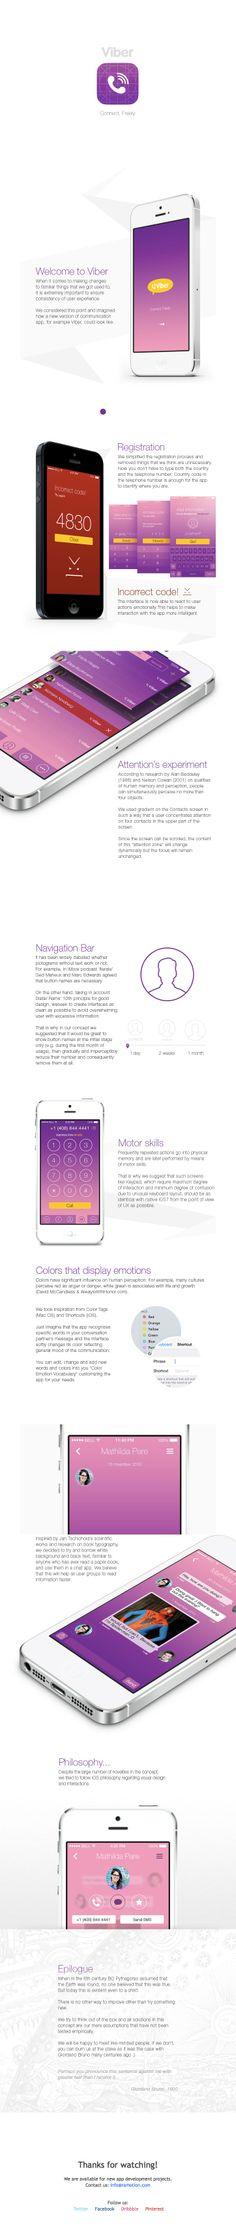 Viber iOS 7 Concept by Ramotion #iOS7 #mobile #UX #UI #GUI #flatdesign